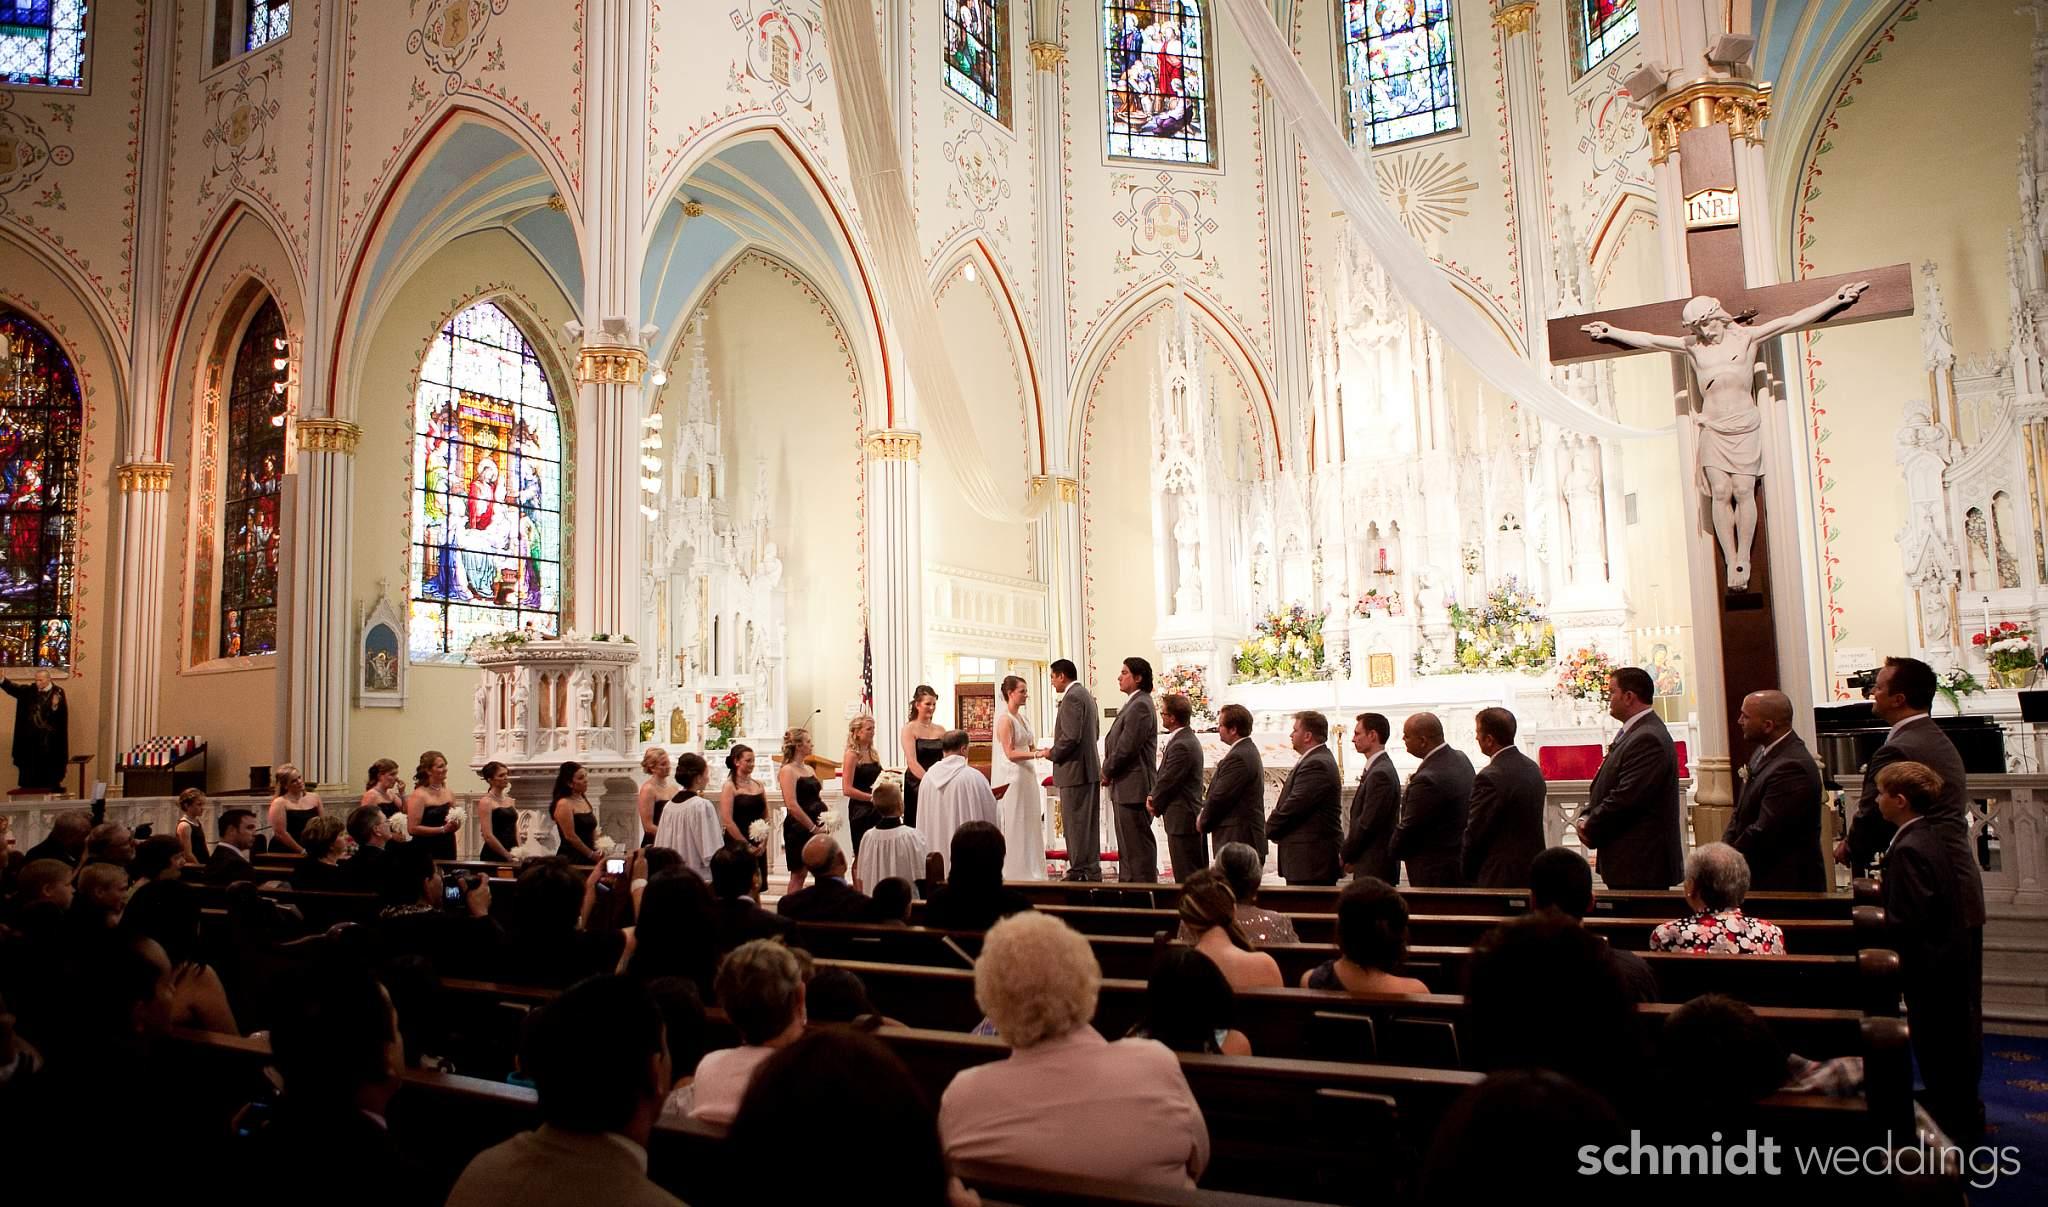 Catholic church wedding picture ideas TS Photo